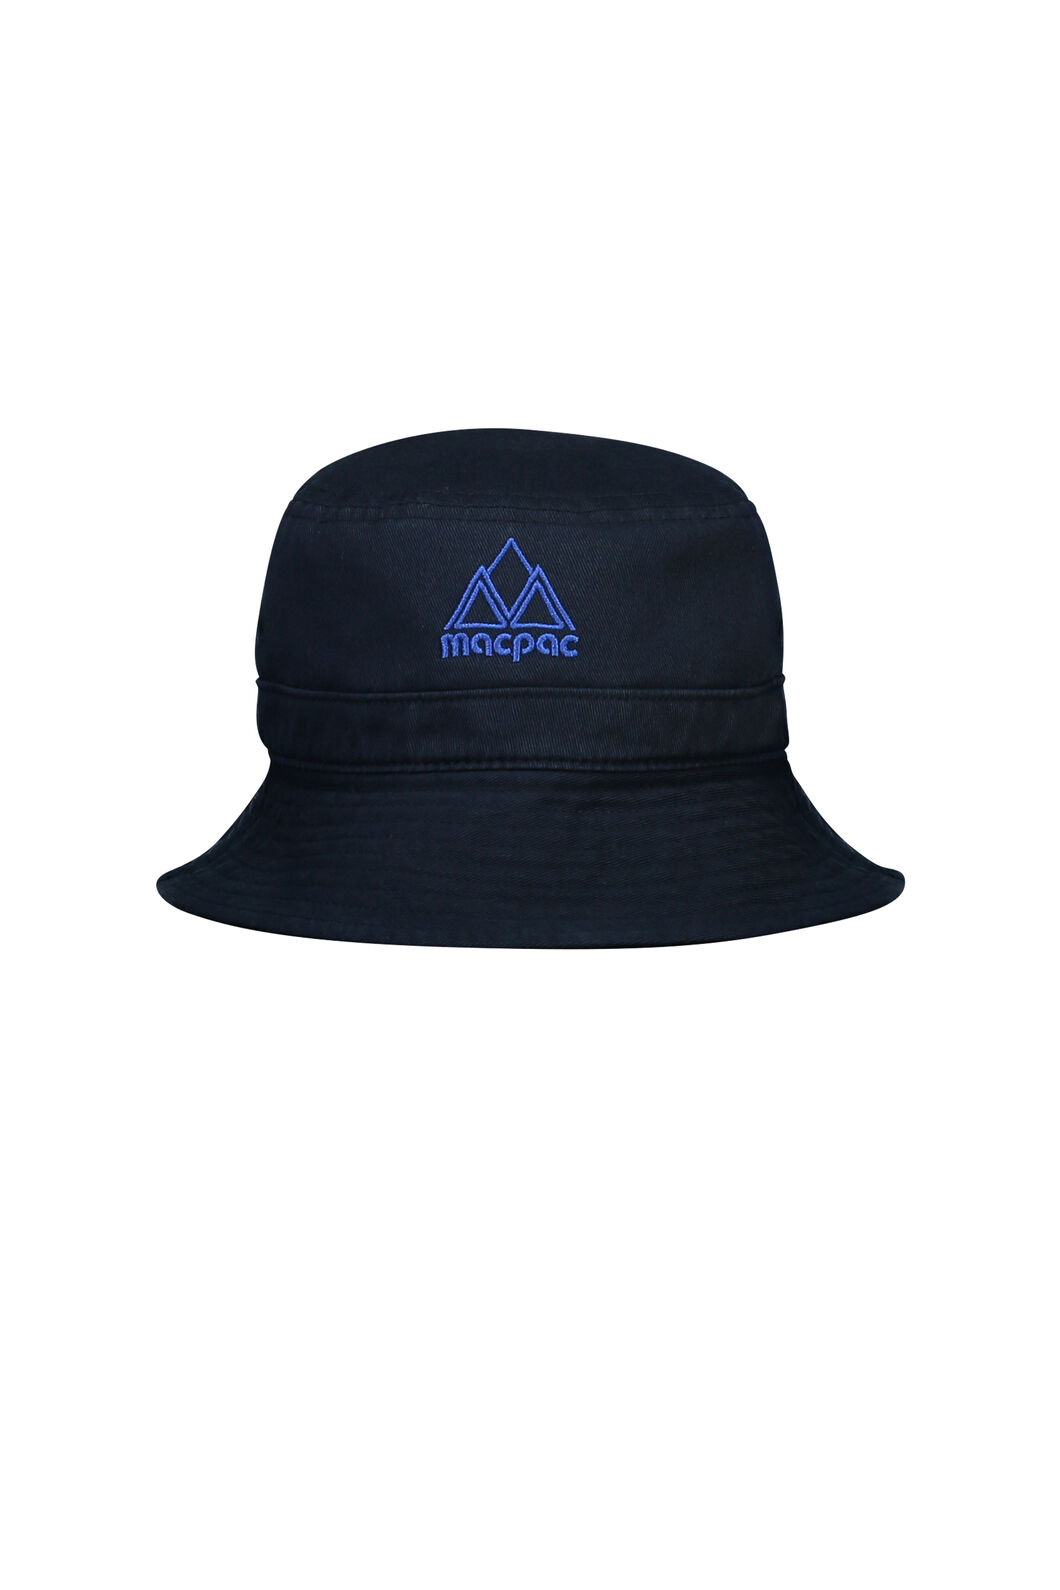 Macpac Bucket Hat - Kids', Carbon, hi-res